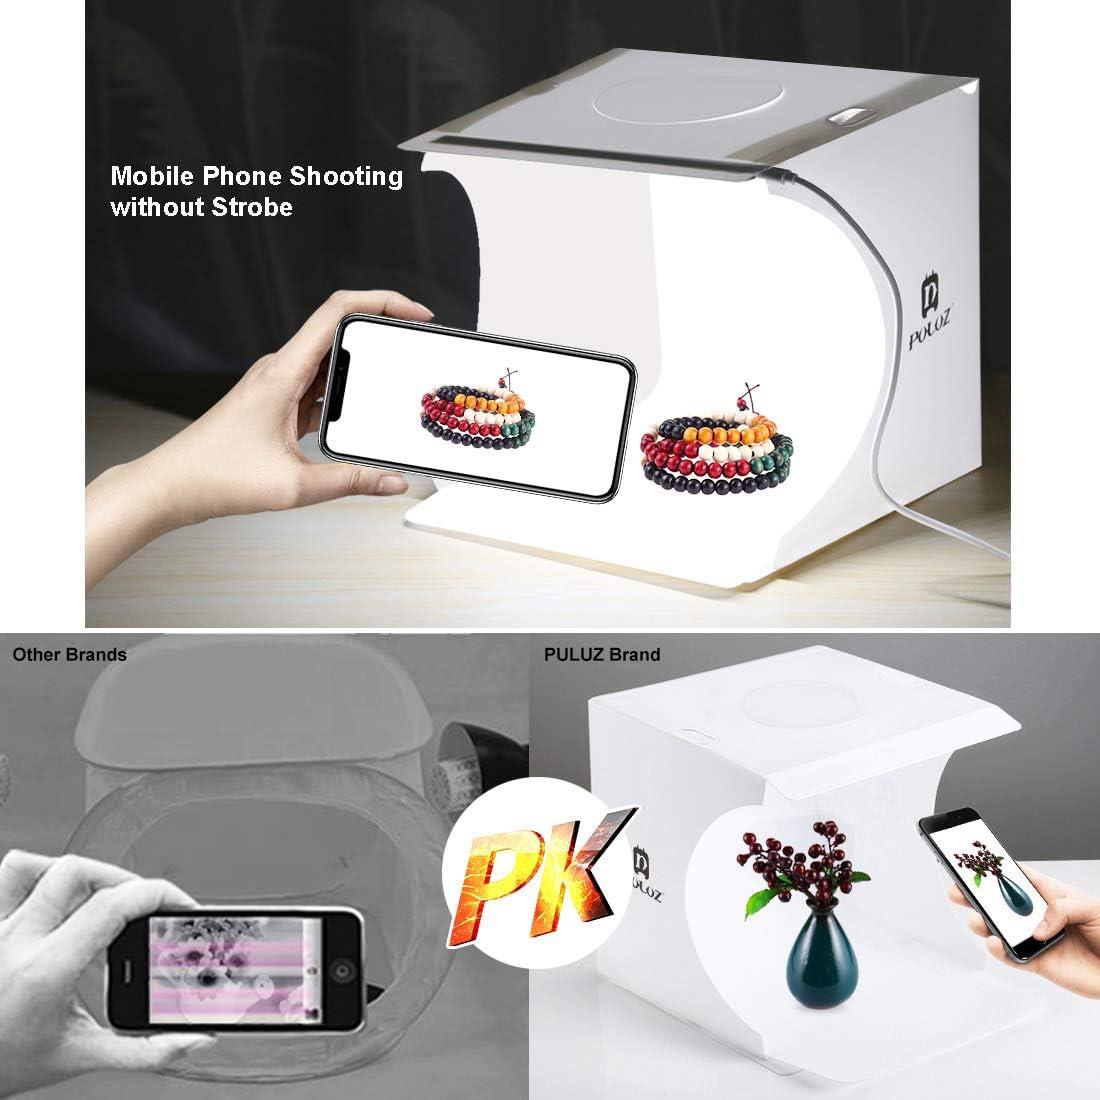 QKa Folding Studio Shooting Tent Portable 550LM Light Photo Lighting Box Kit with 6 Colors Backdrops Photo Background Shooting Tents